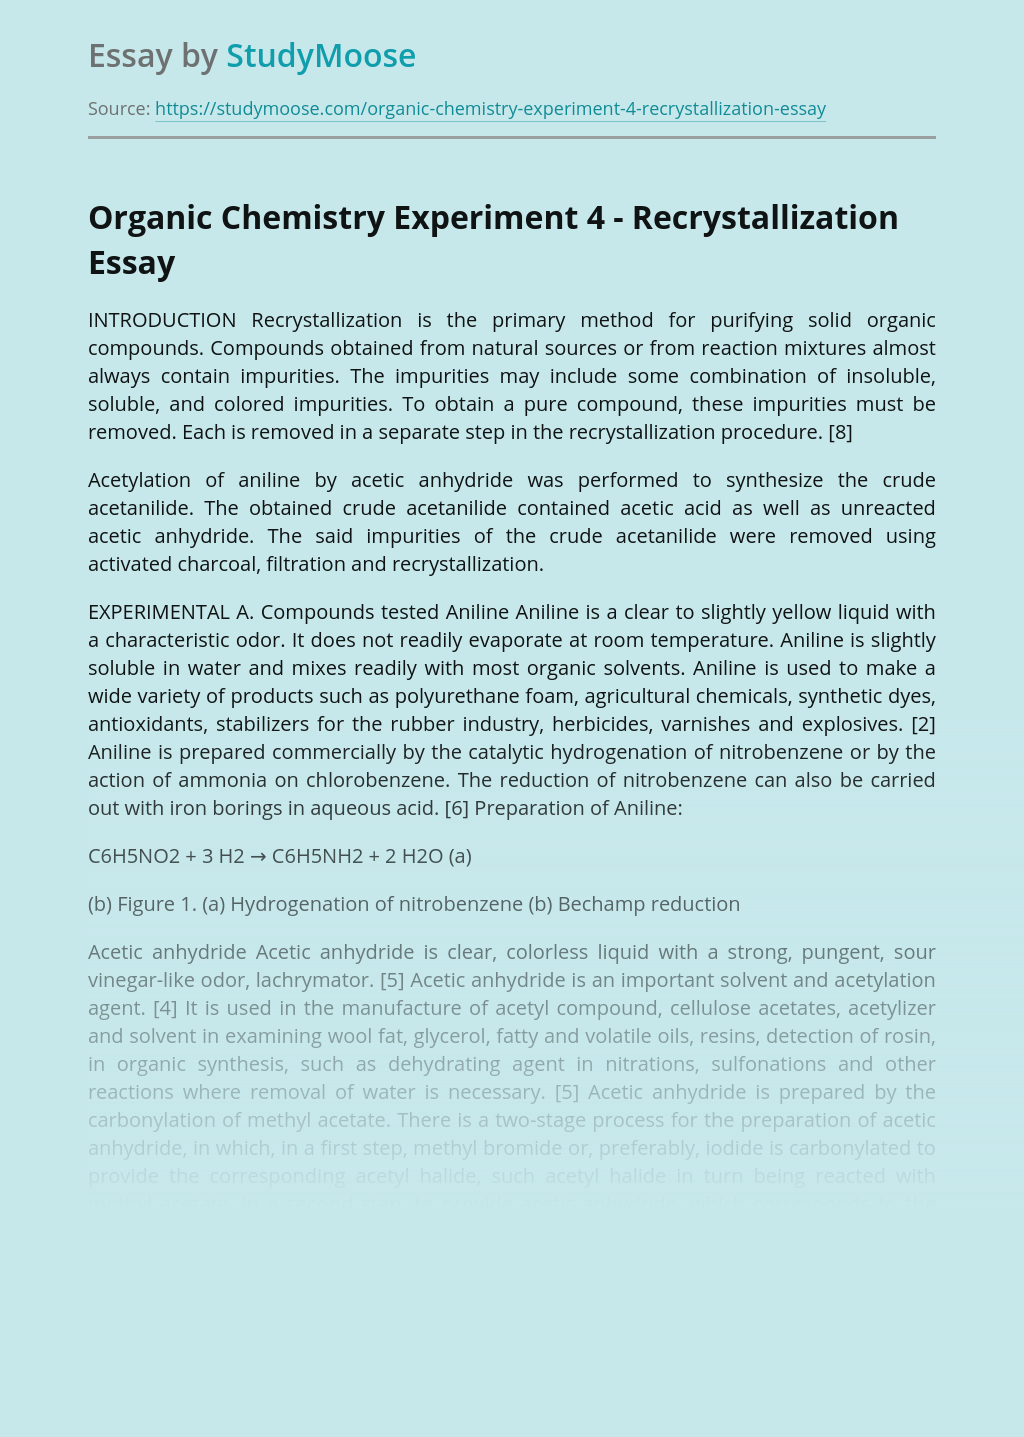 Organic Chemistry Experiment 4 - Recrystallization